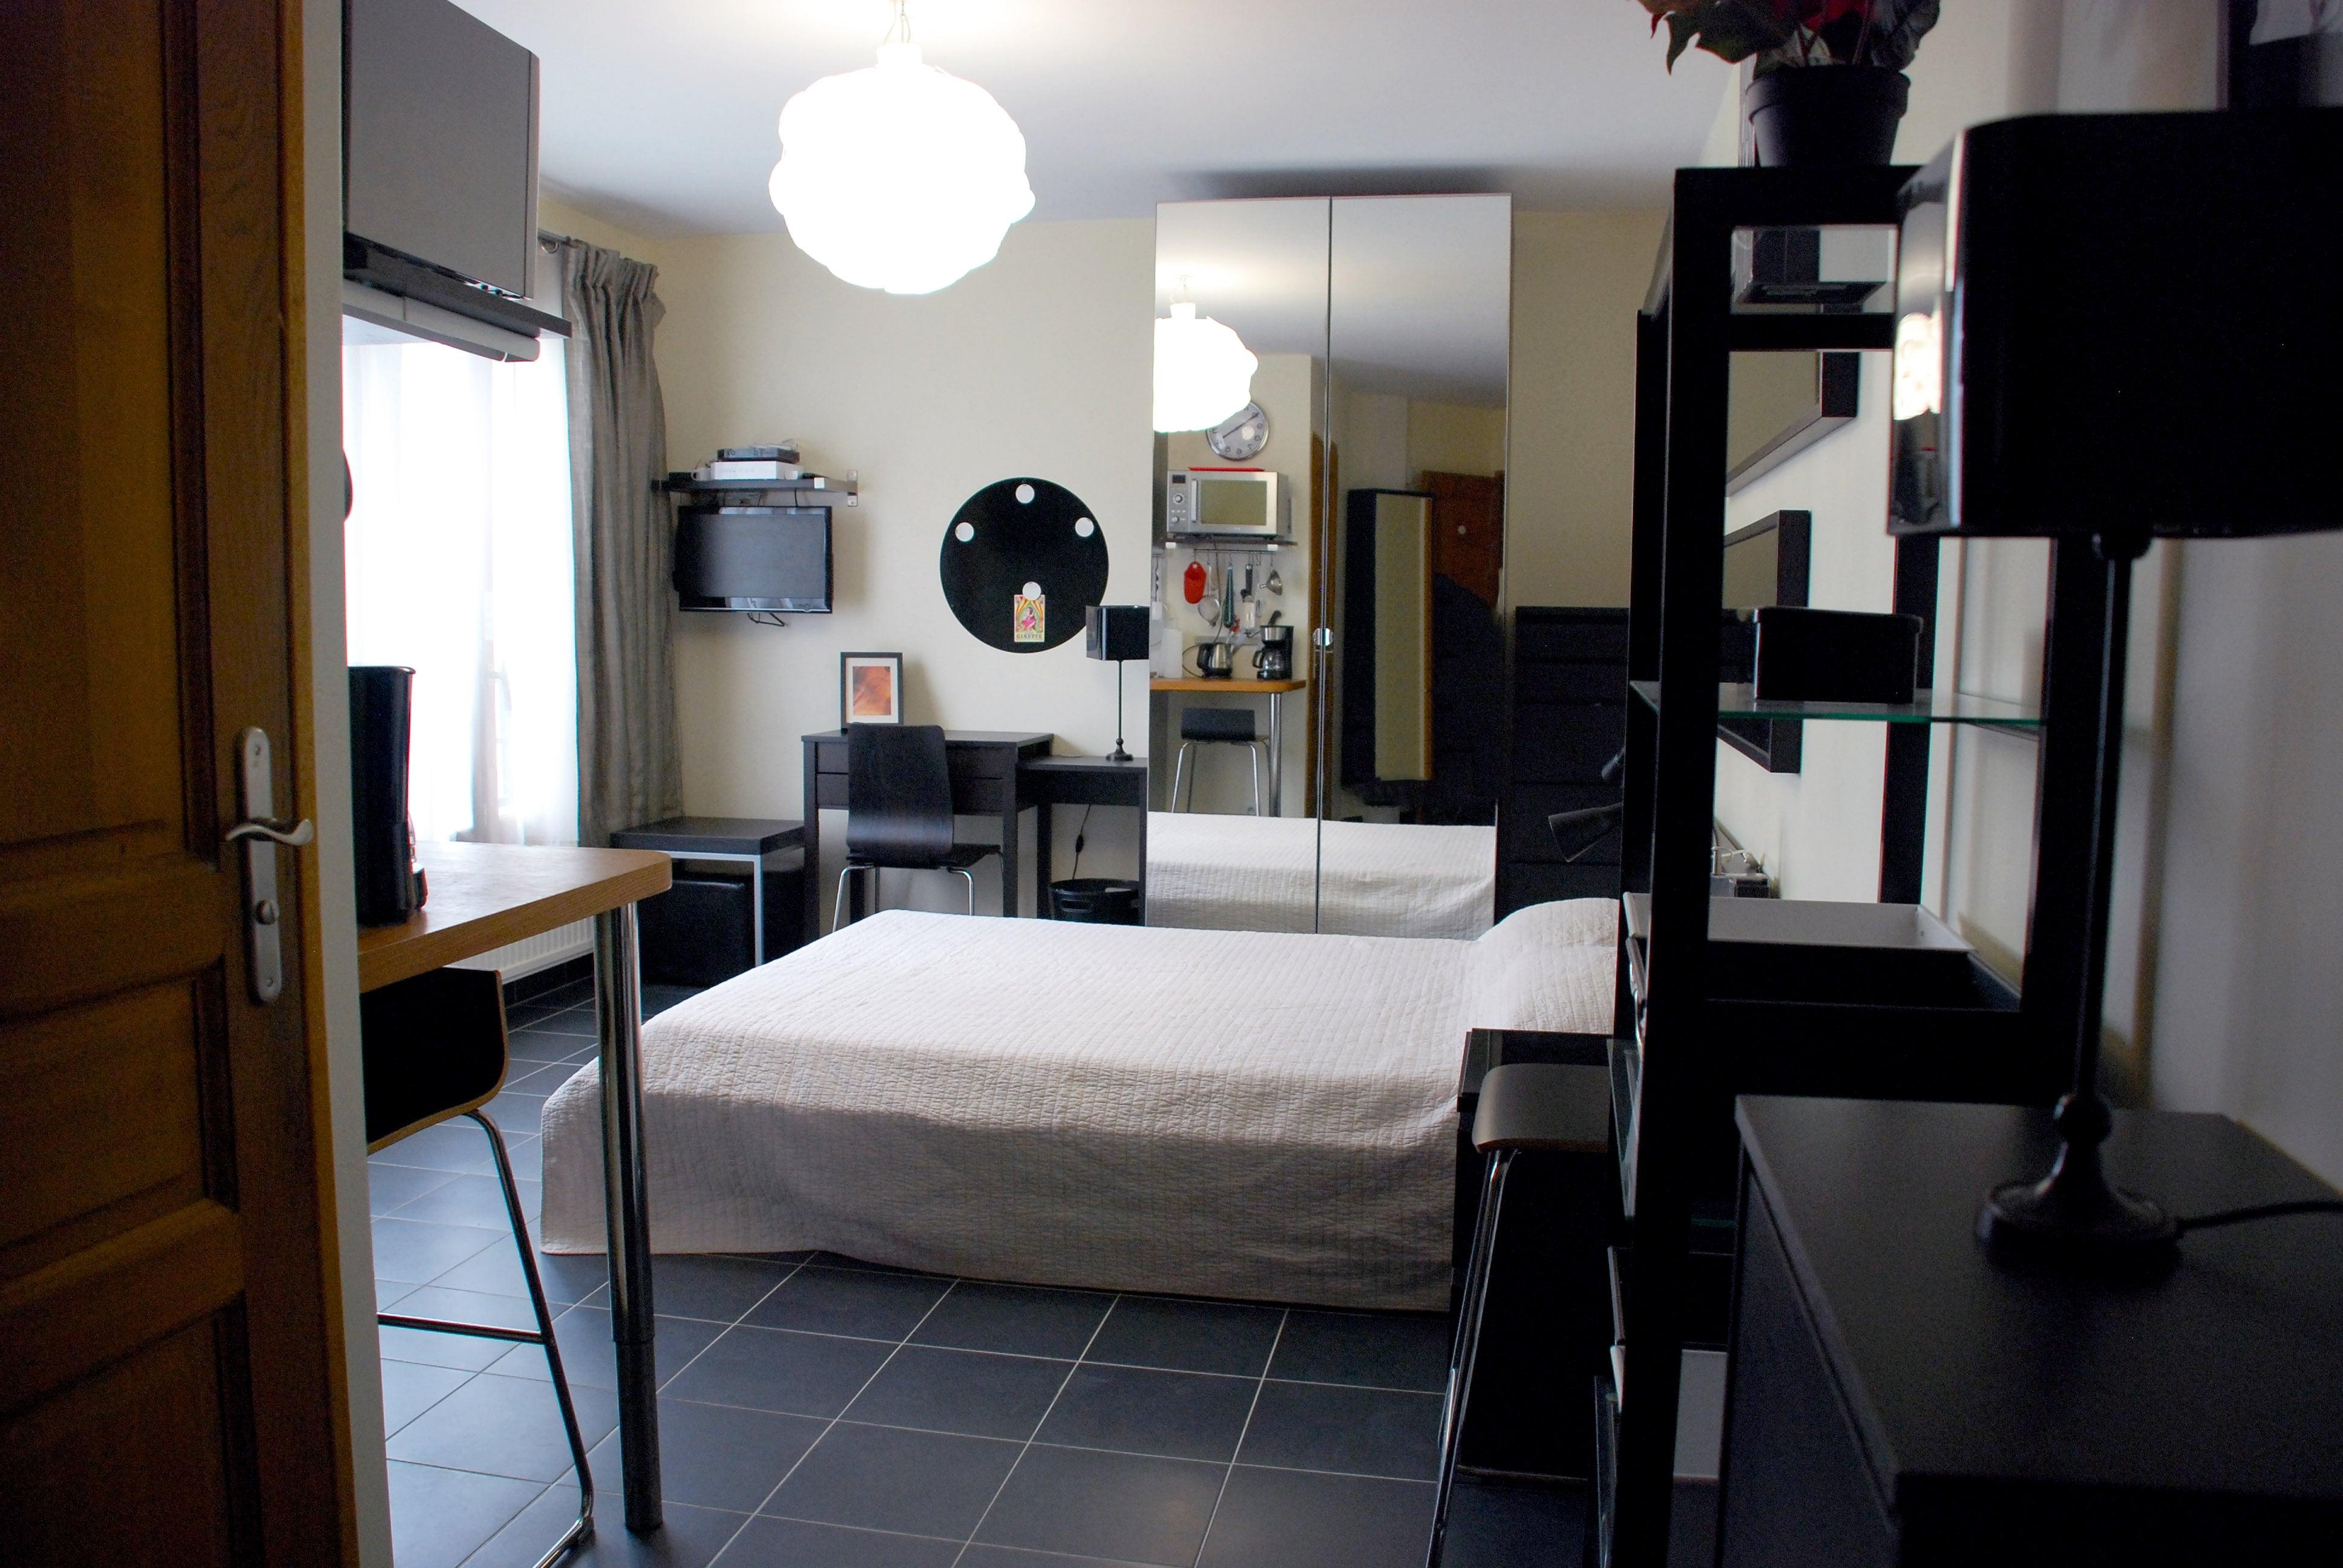 appartement studio meublé versailles genet salon